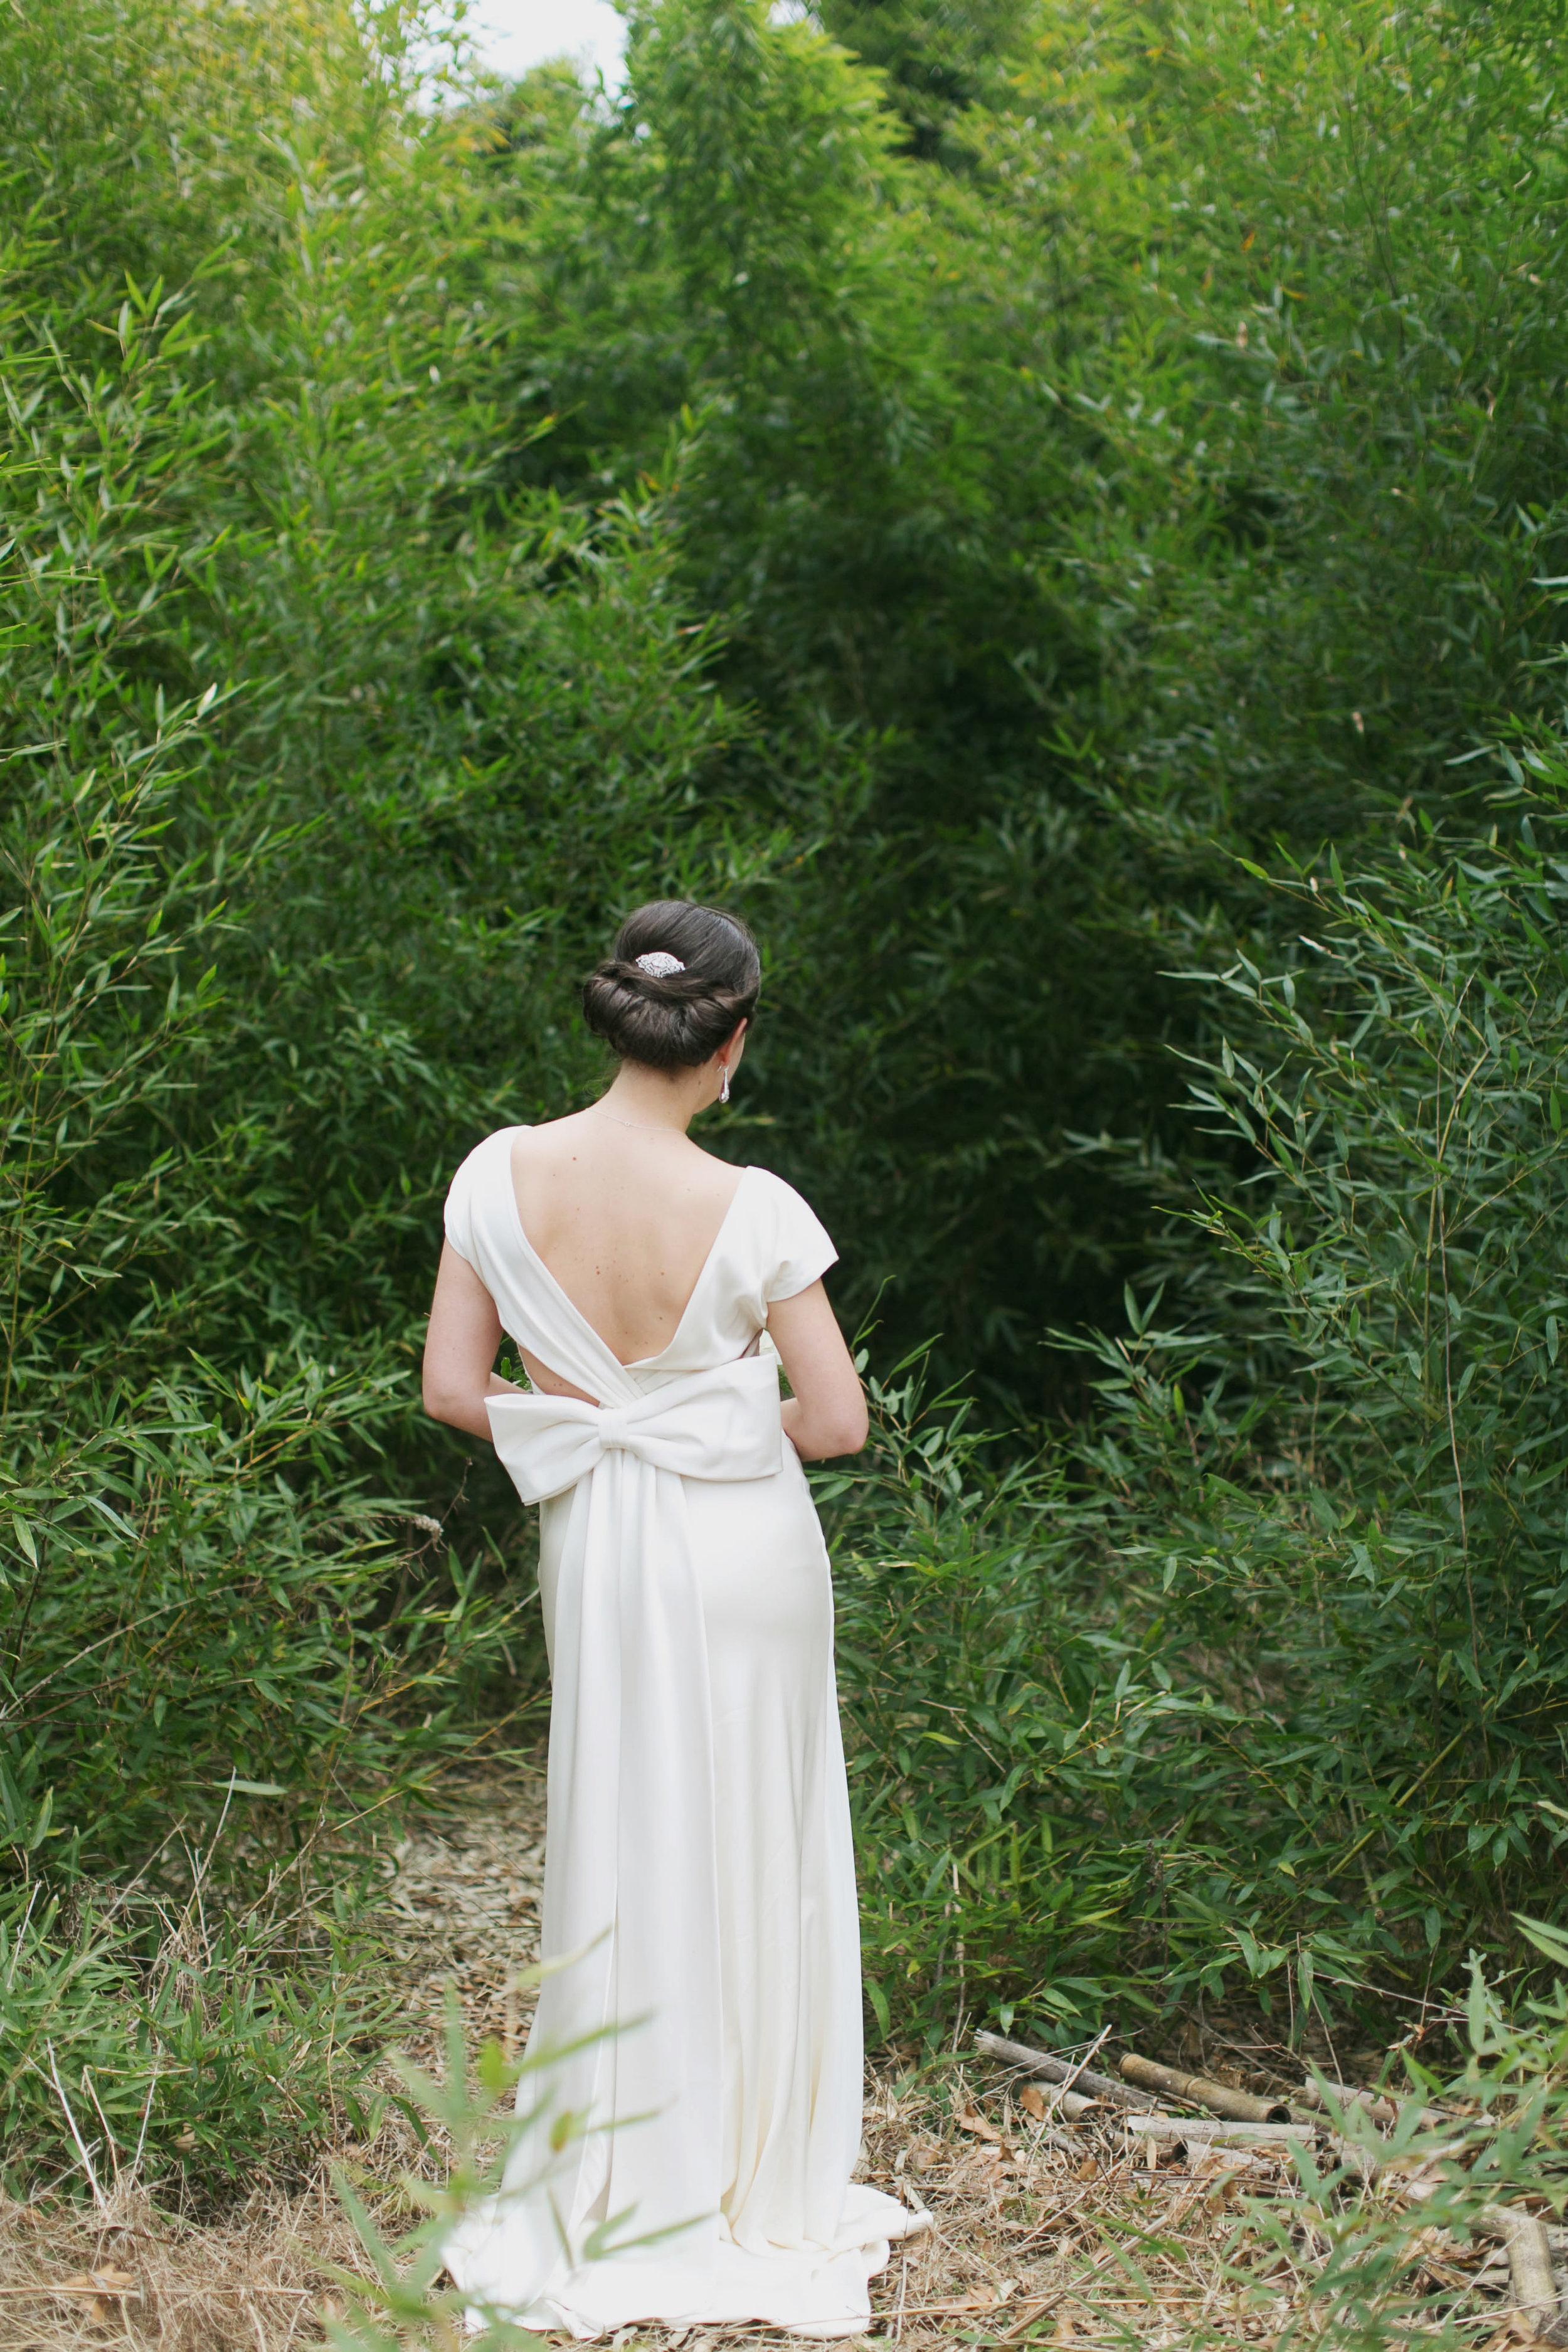 Simply-Charming-Socials_Atlanta-Wedding-Planner_Our-Labor-Of-Love_Emily-and-Jon_7.jpg